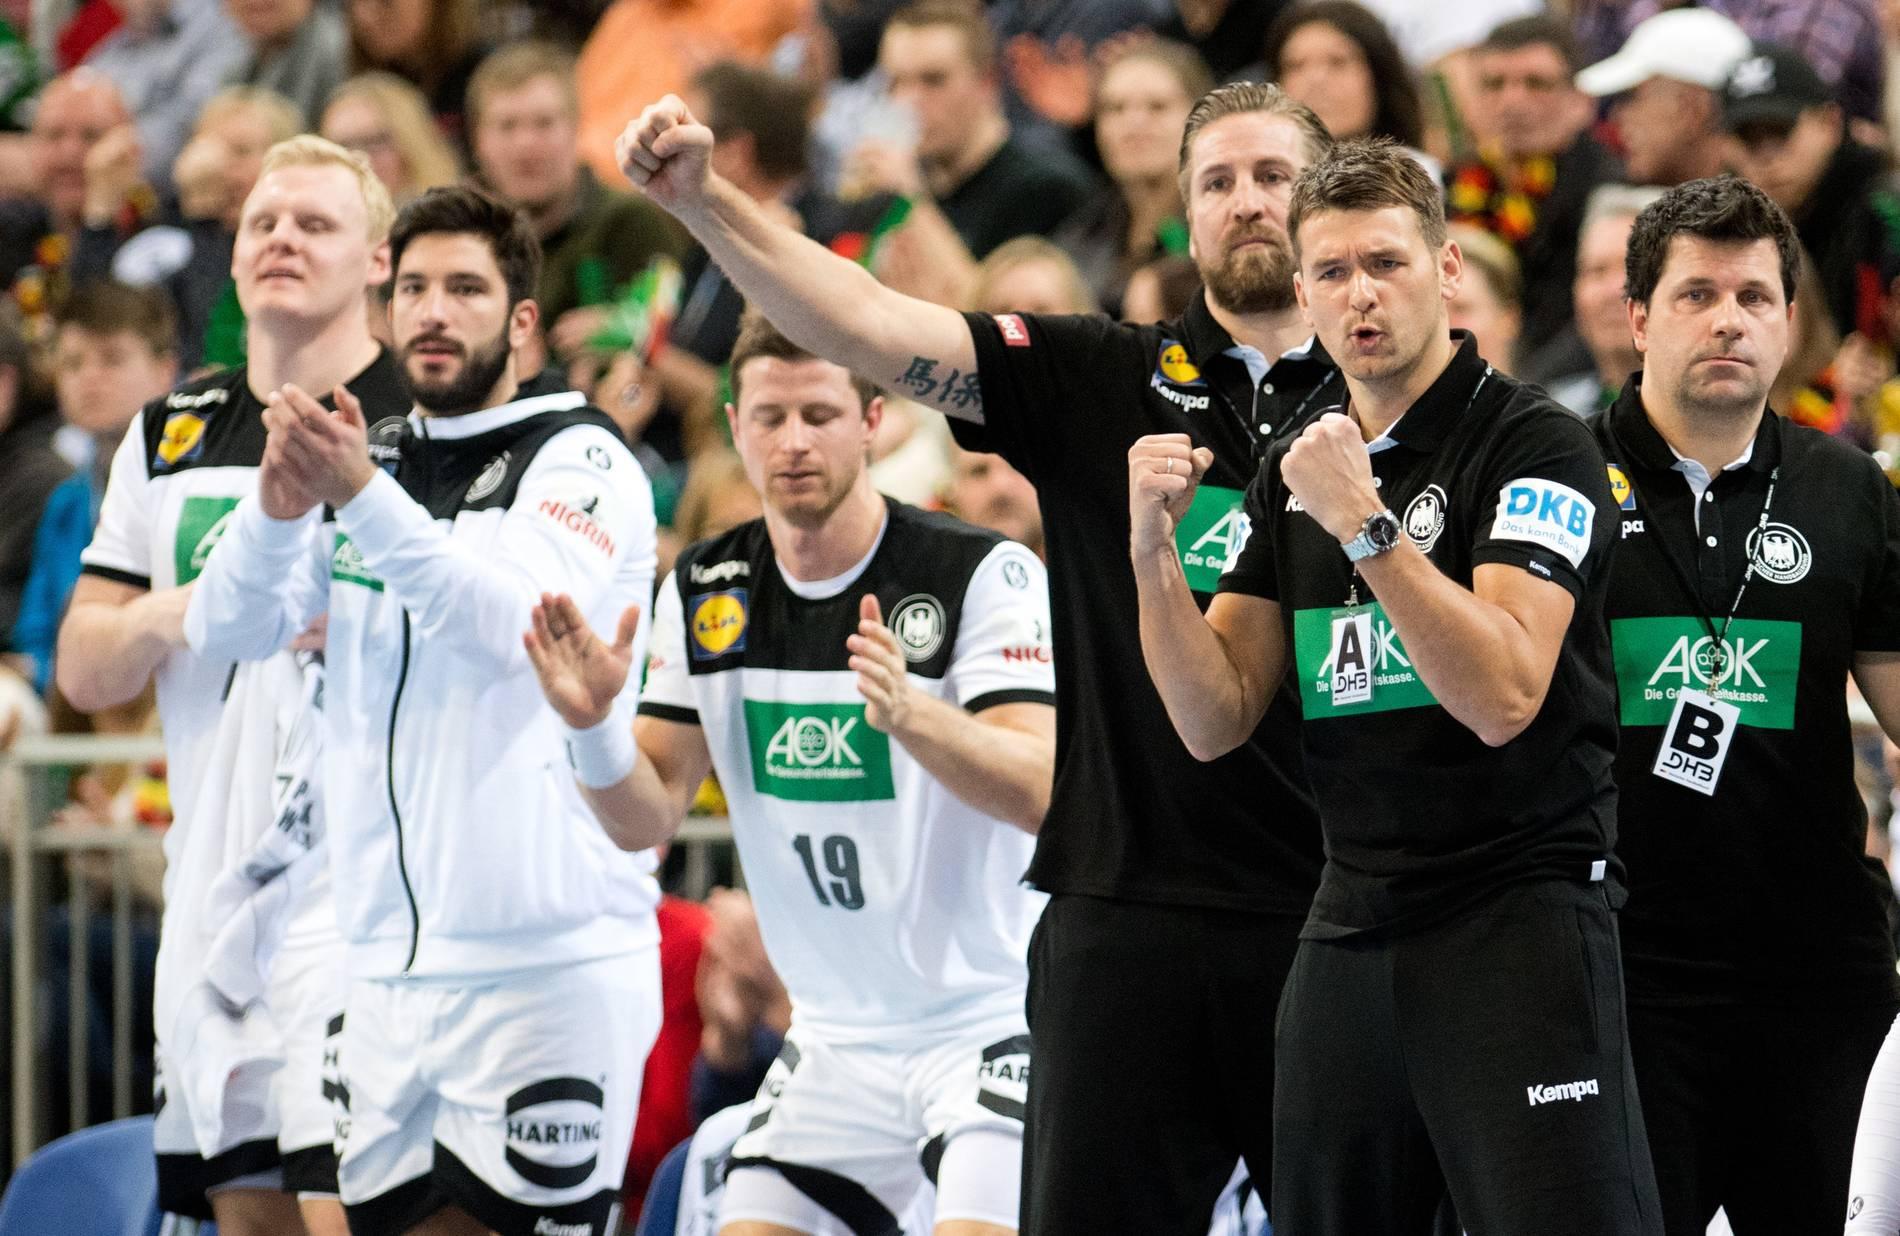 Handball Wm Live Score